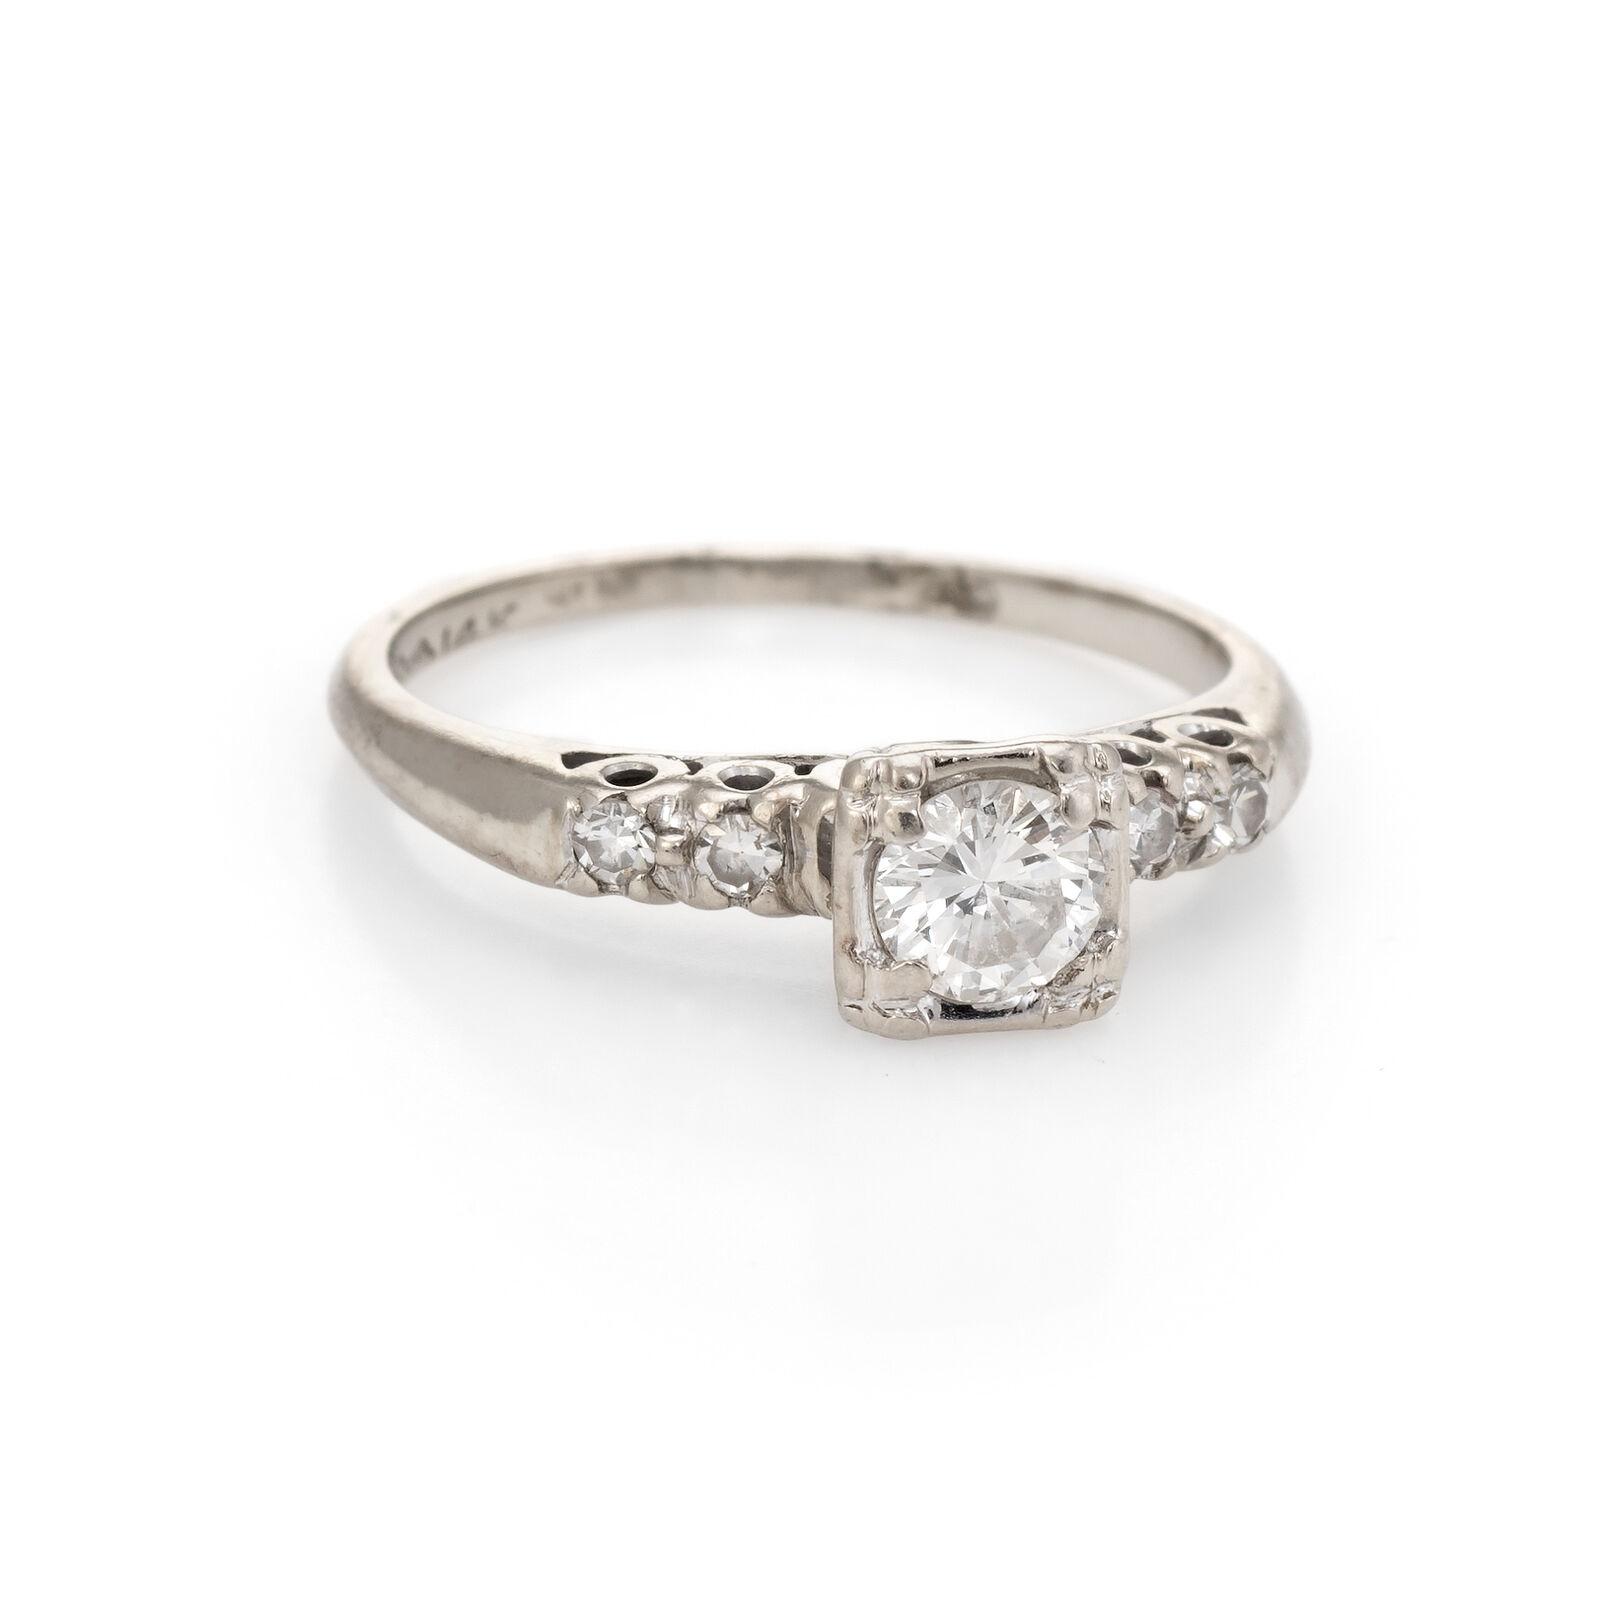 Diamond Engagement Ring Vintage 14k White gold Estate Fine Jewelry Bridal Sz 6